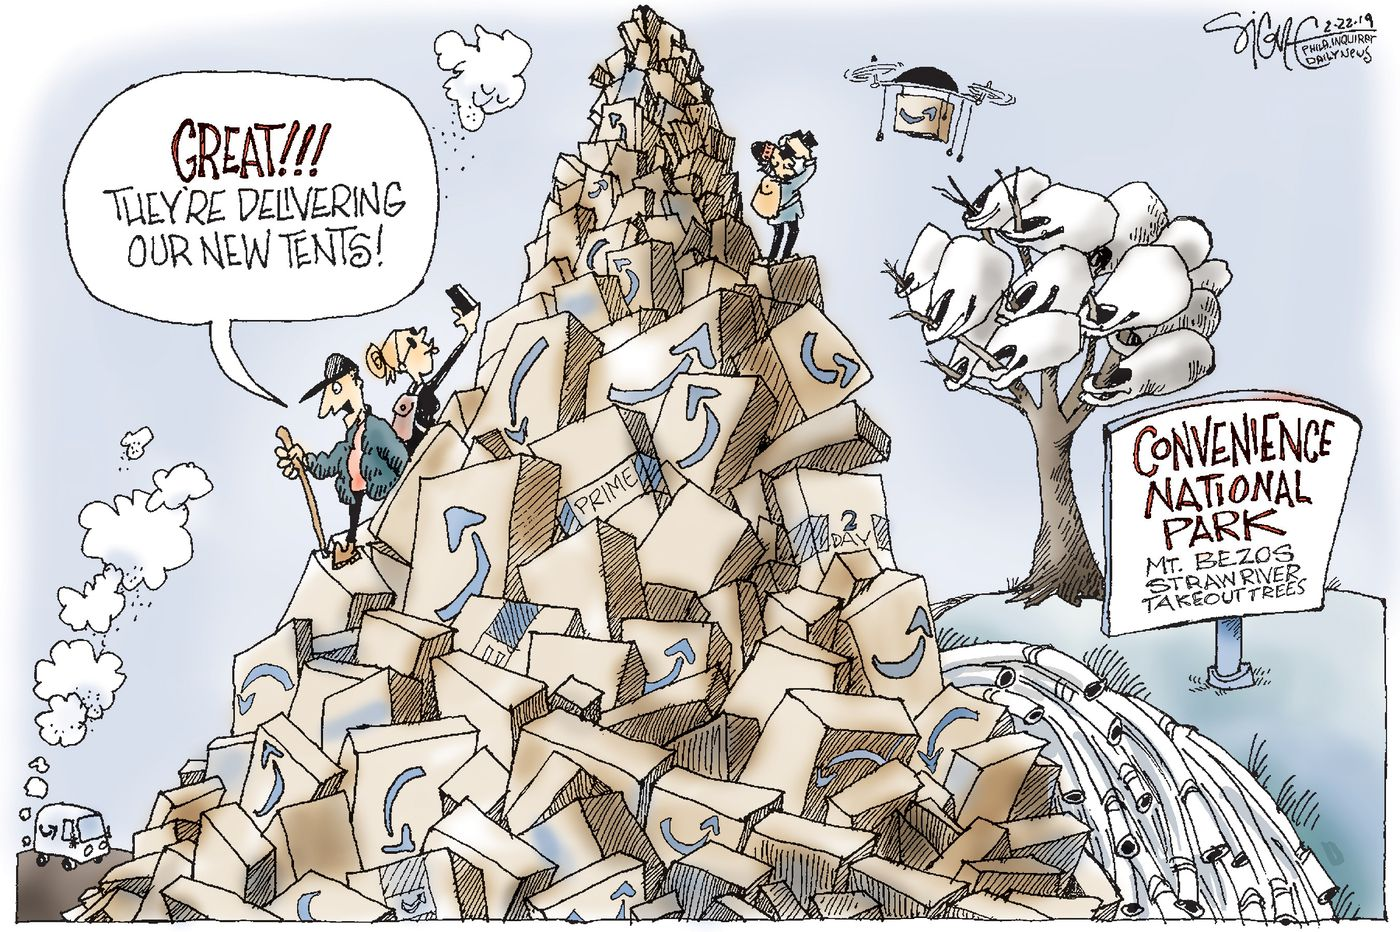 Political Cartoon: Convenience National Park